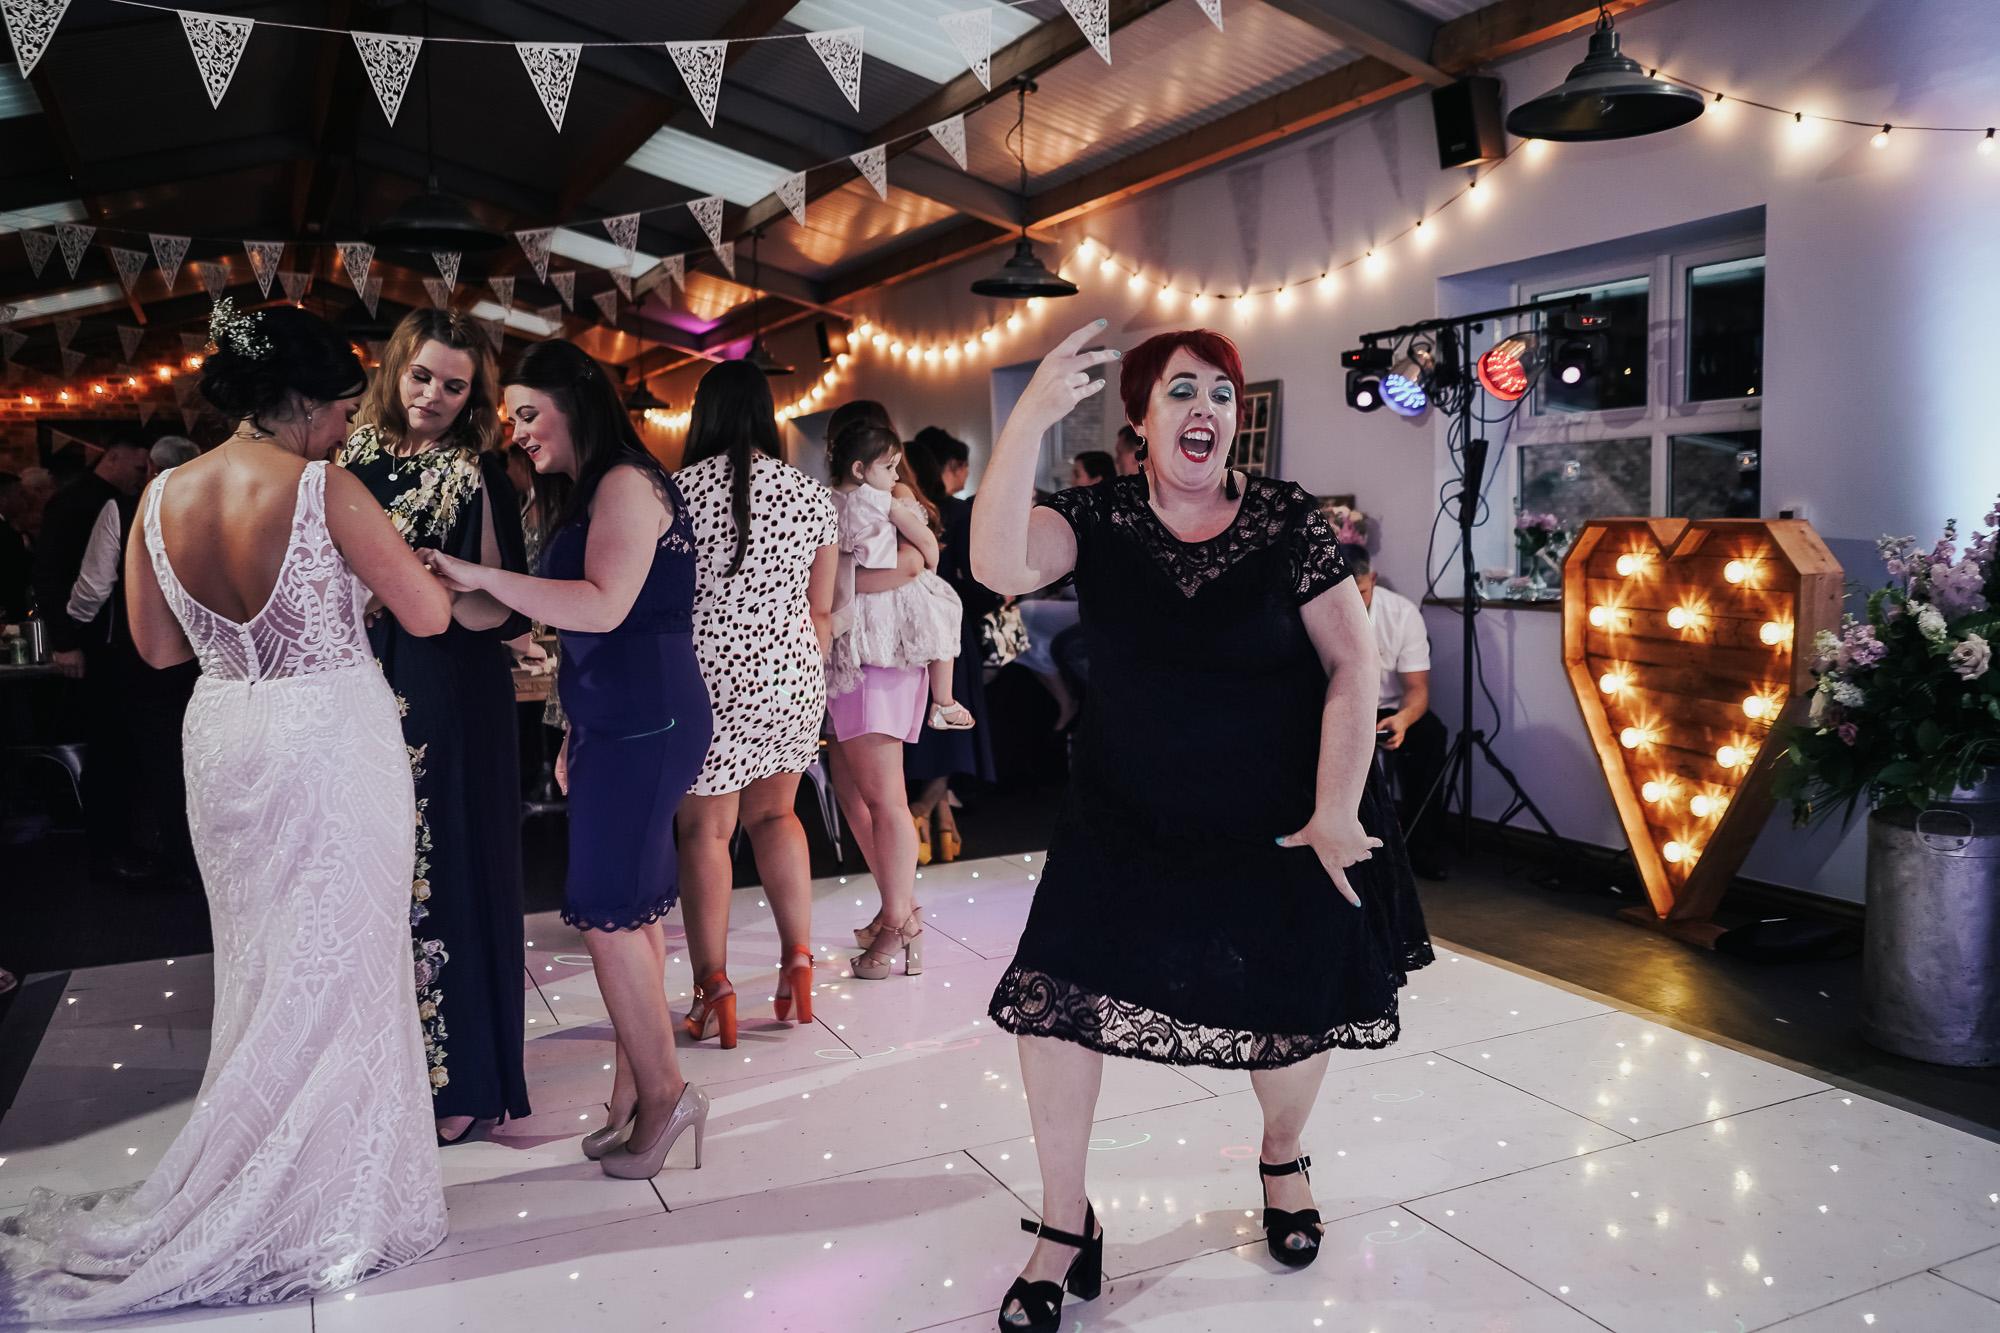 The Hayloft Wedding Photography Cheshire wedding photographer (51 of 52).jpg